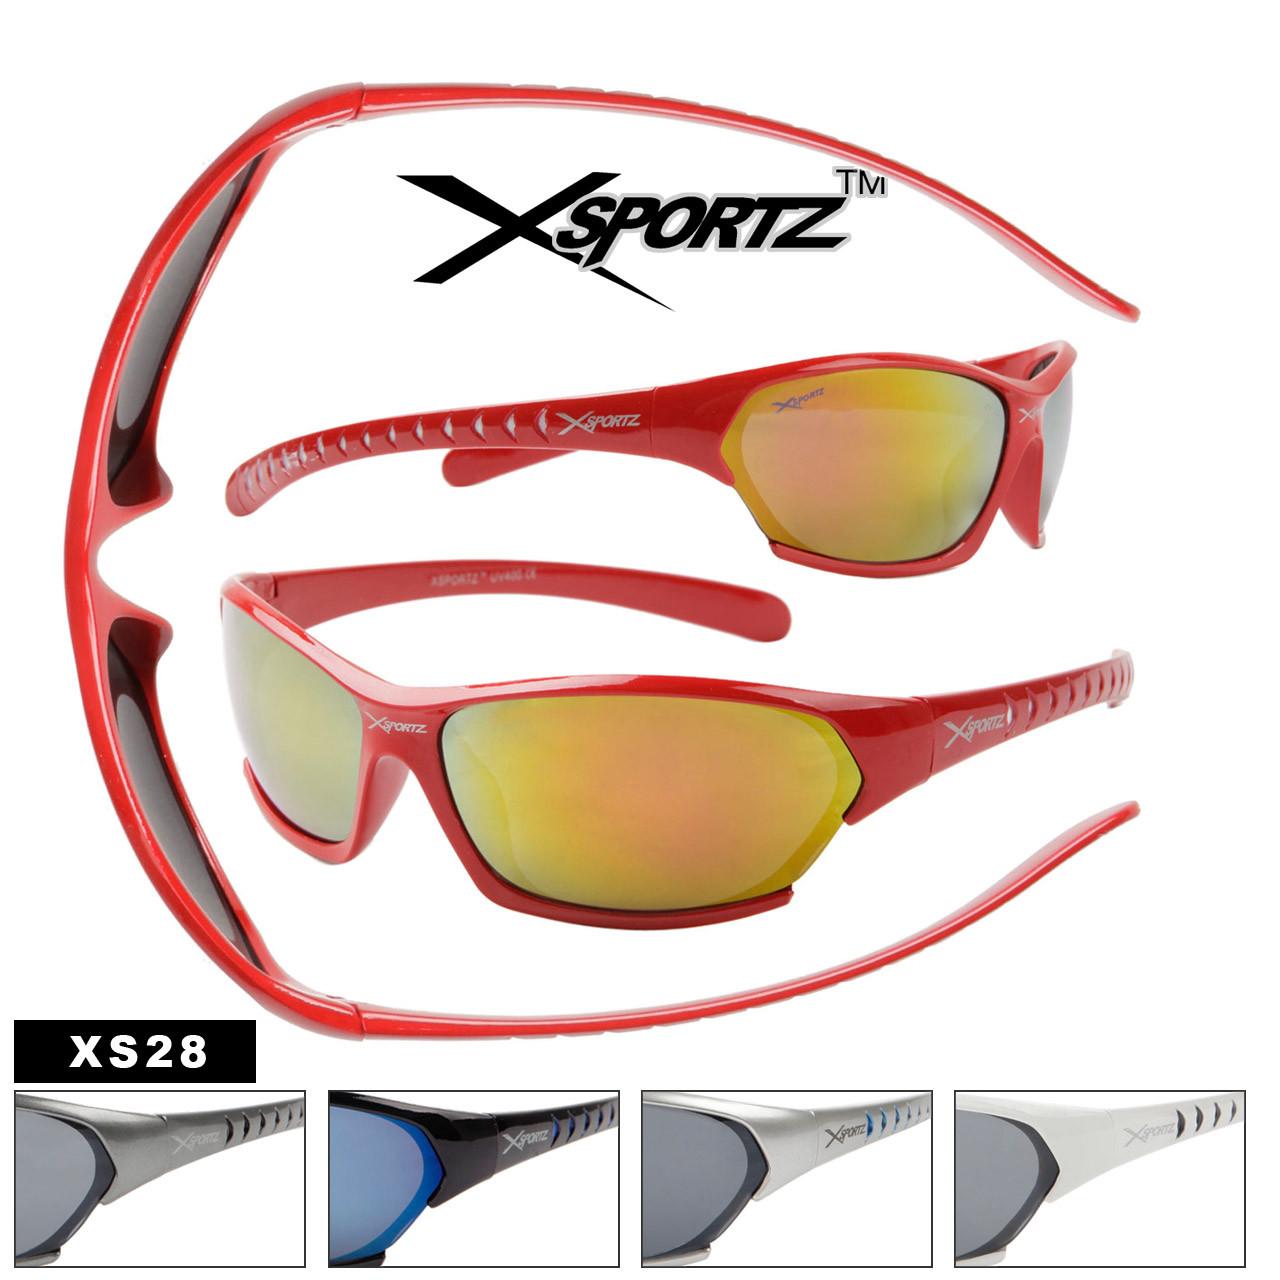 Wholesale Xsportz Sport Sunglasses XS28